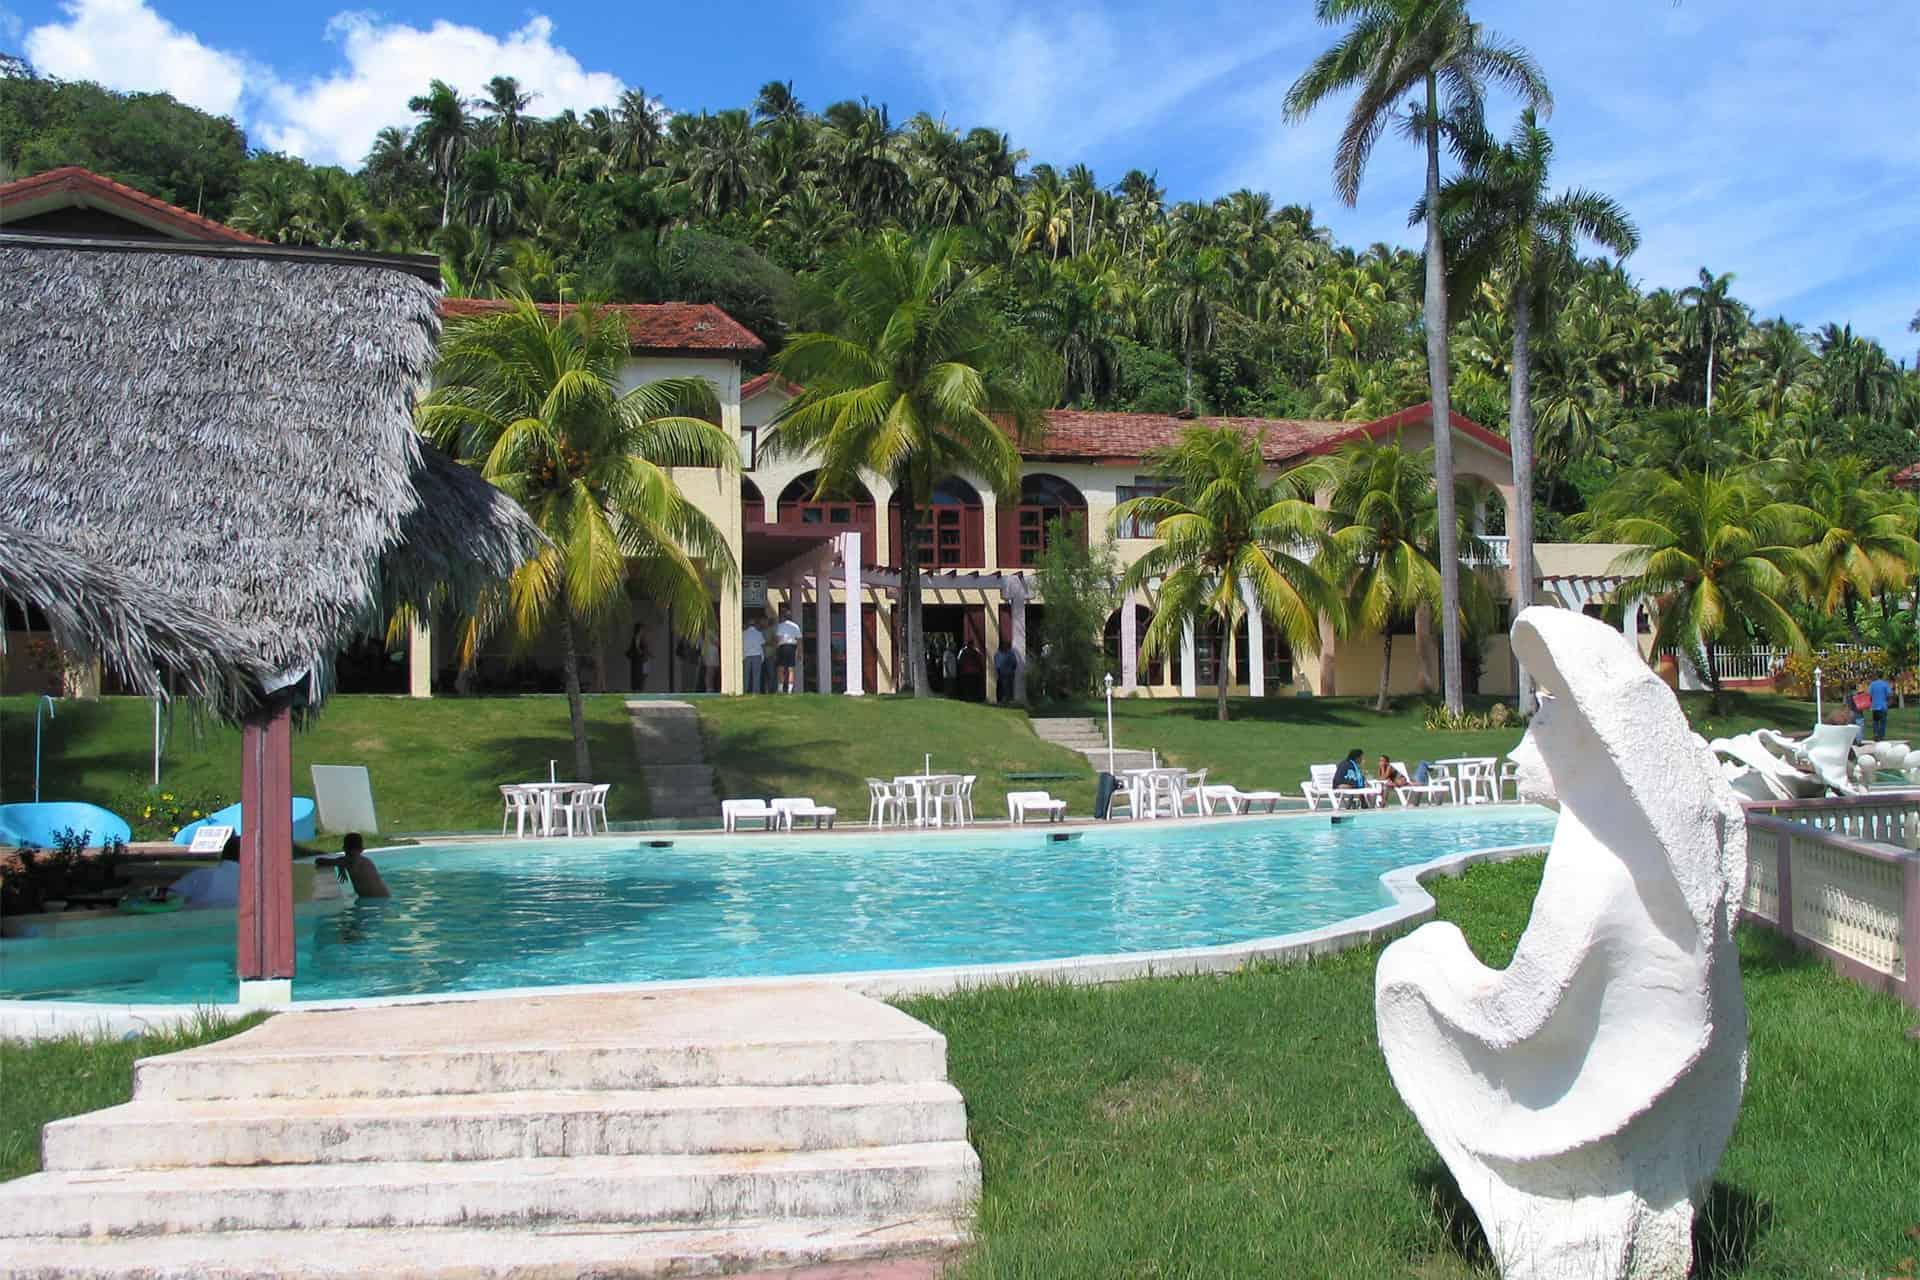 baracoa hotel piscine cuba autrement